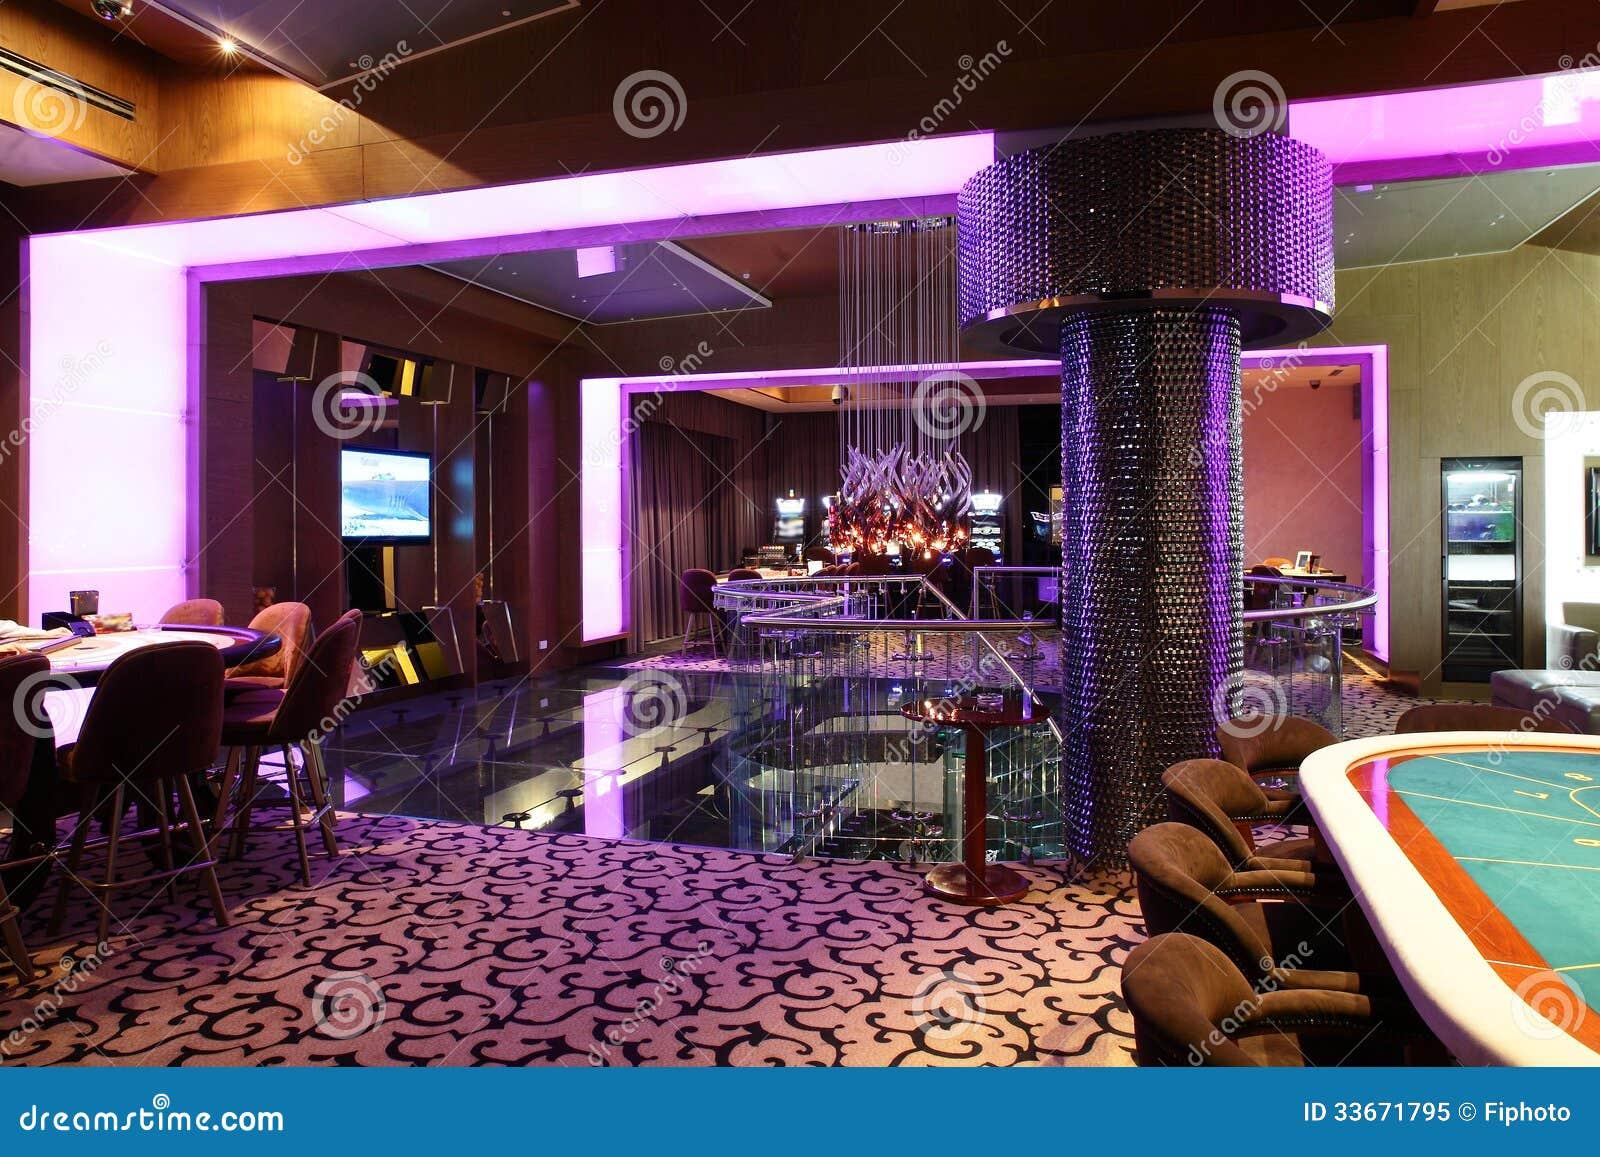 Обзор онлайн-казино Виктория | Casino Victoria